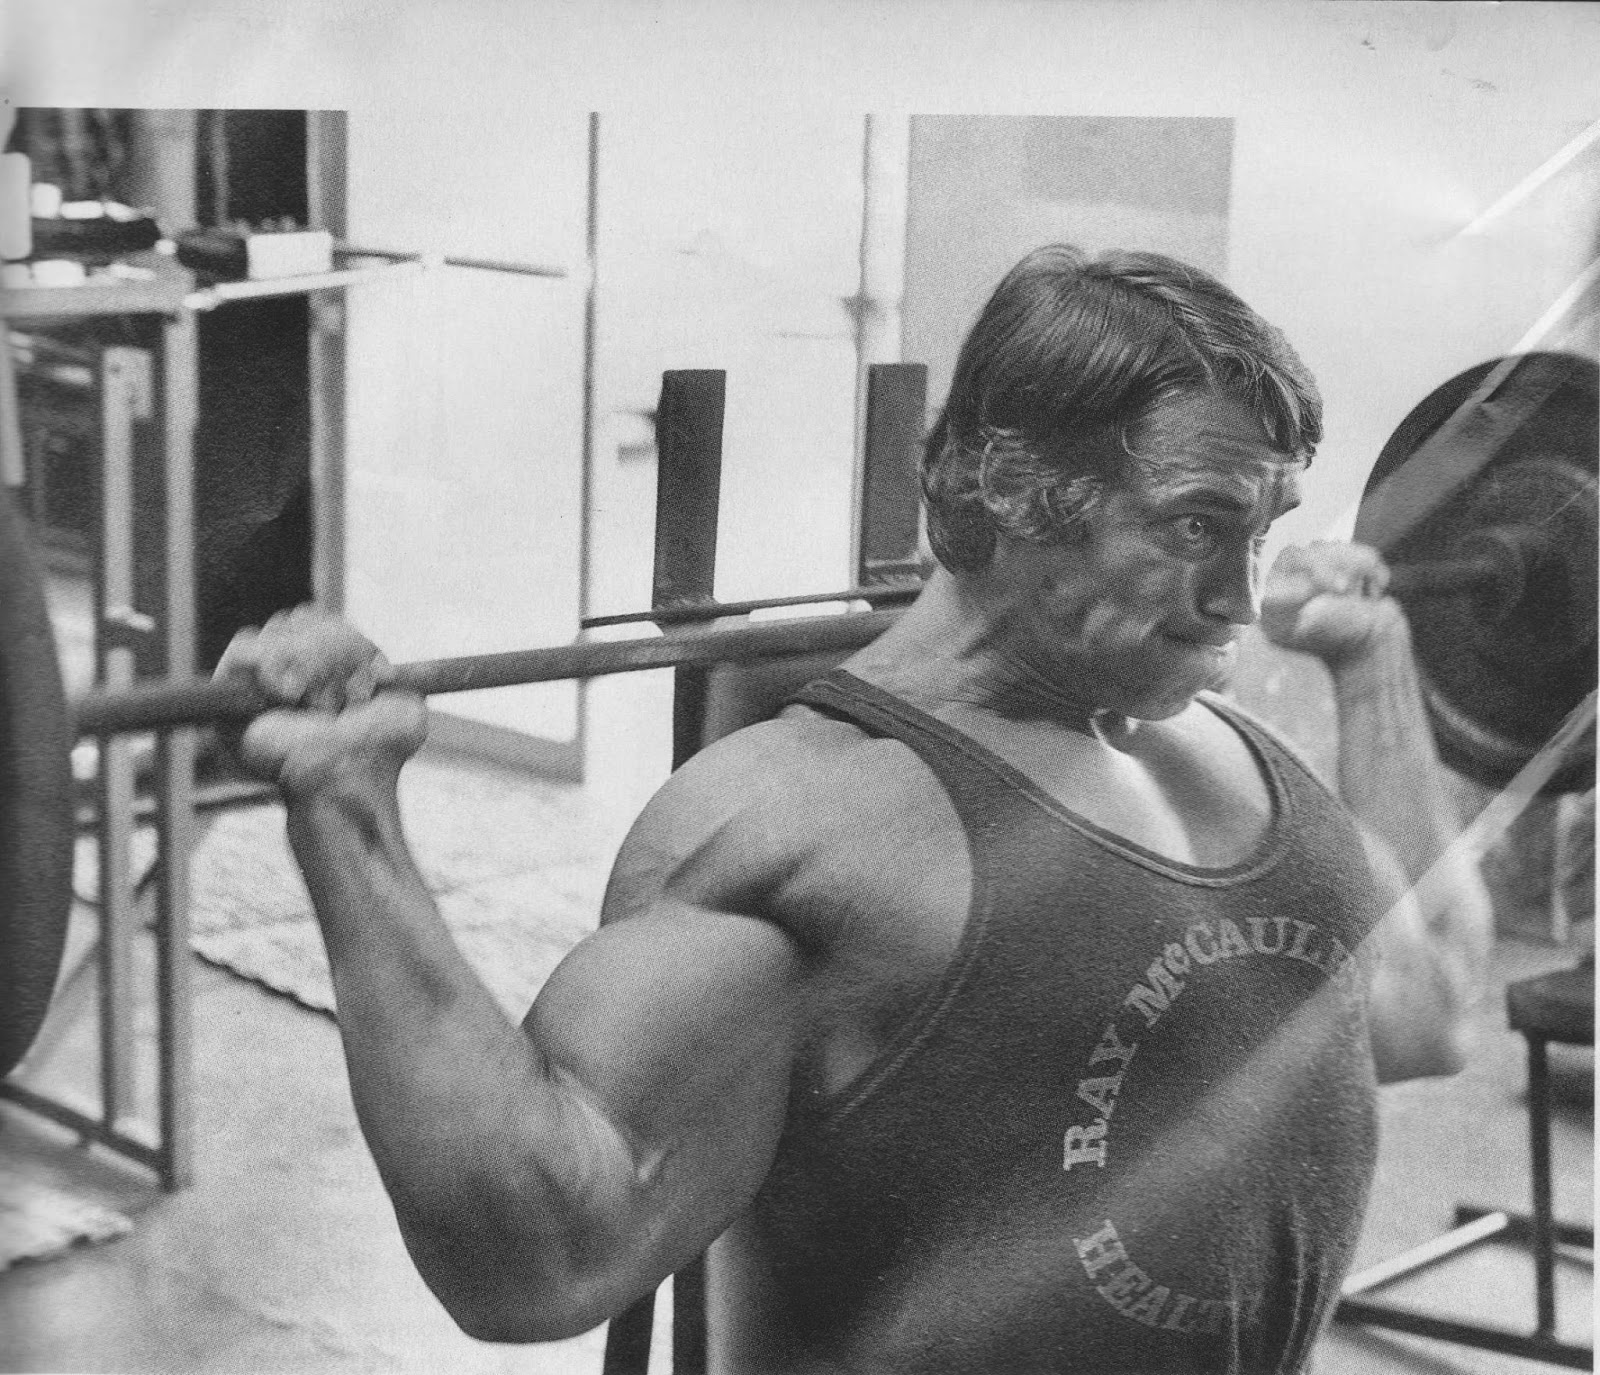 The Tight Tan Slacks Of Dezso Ban Shoulder Training